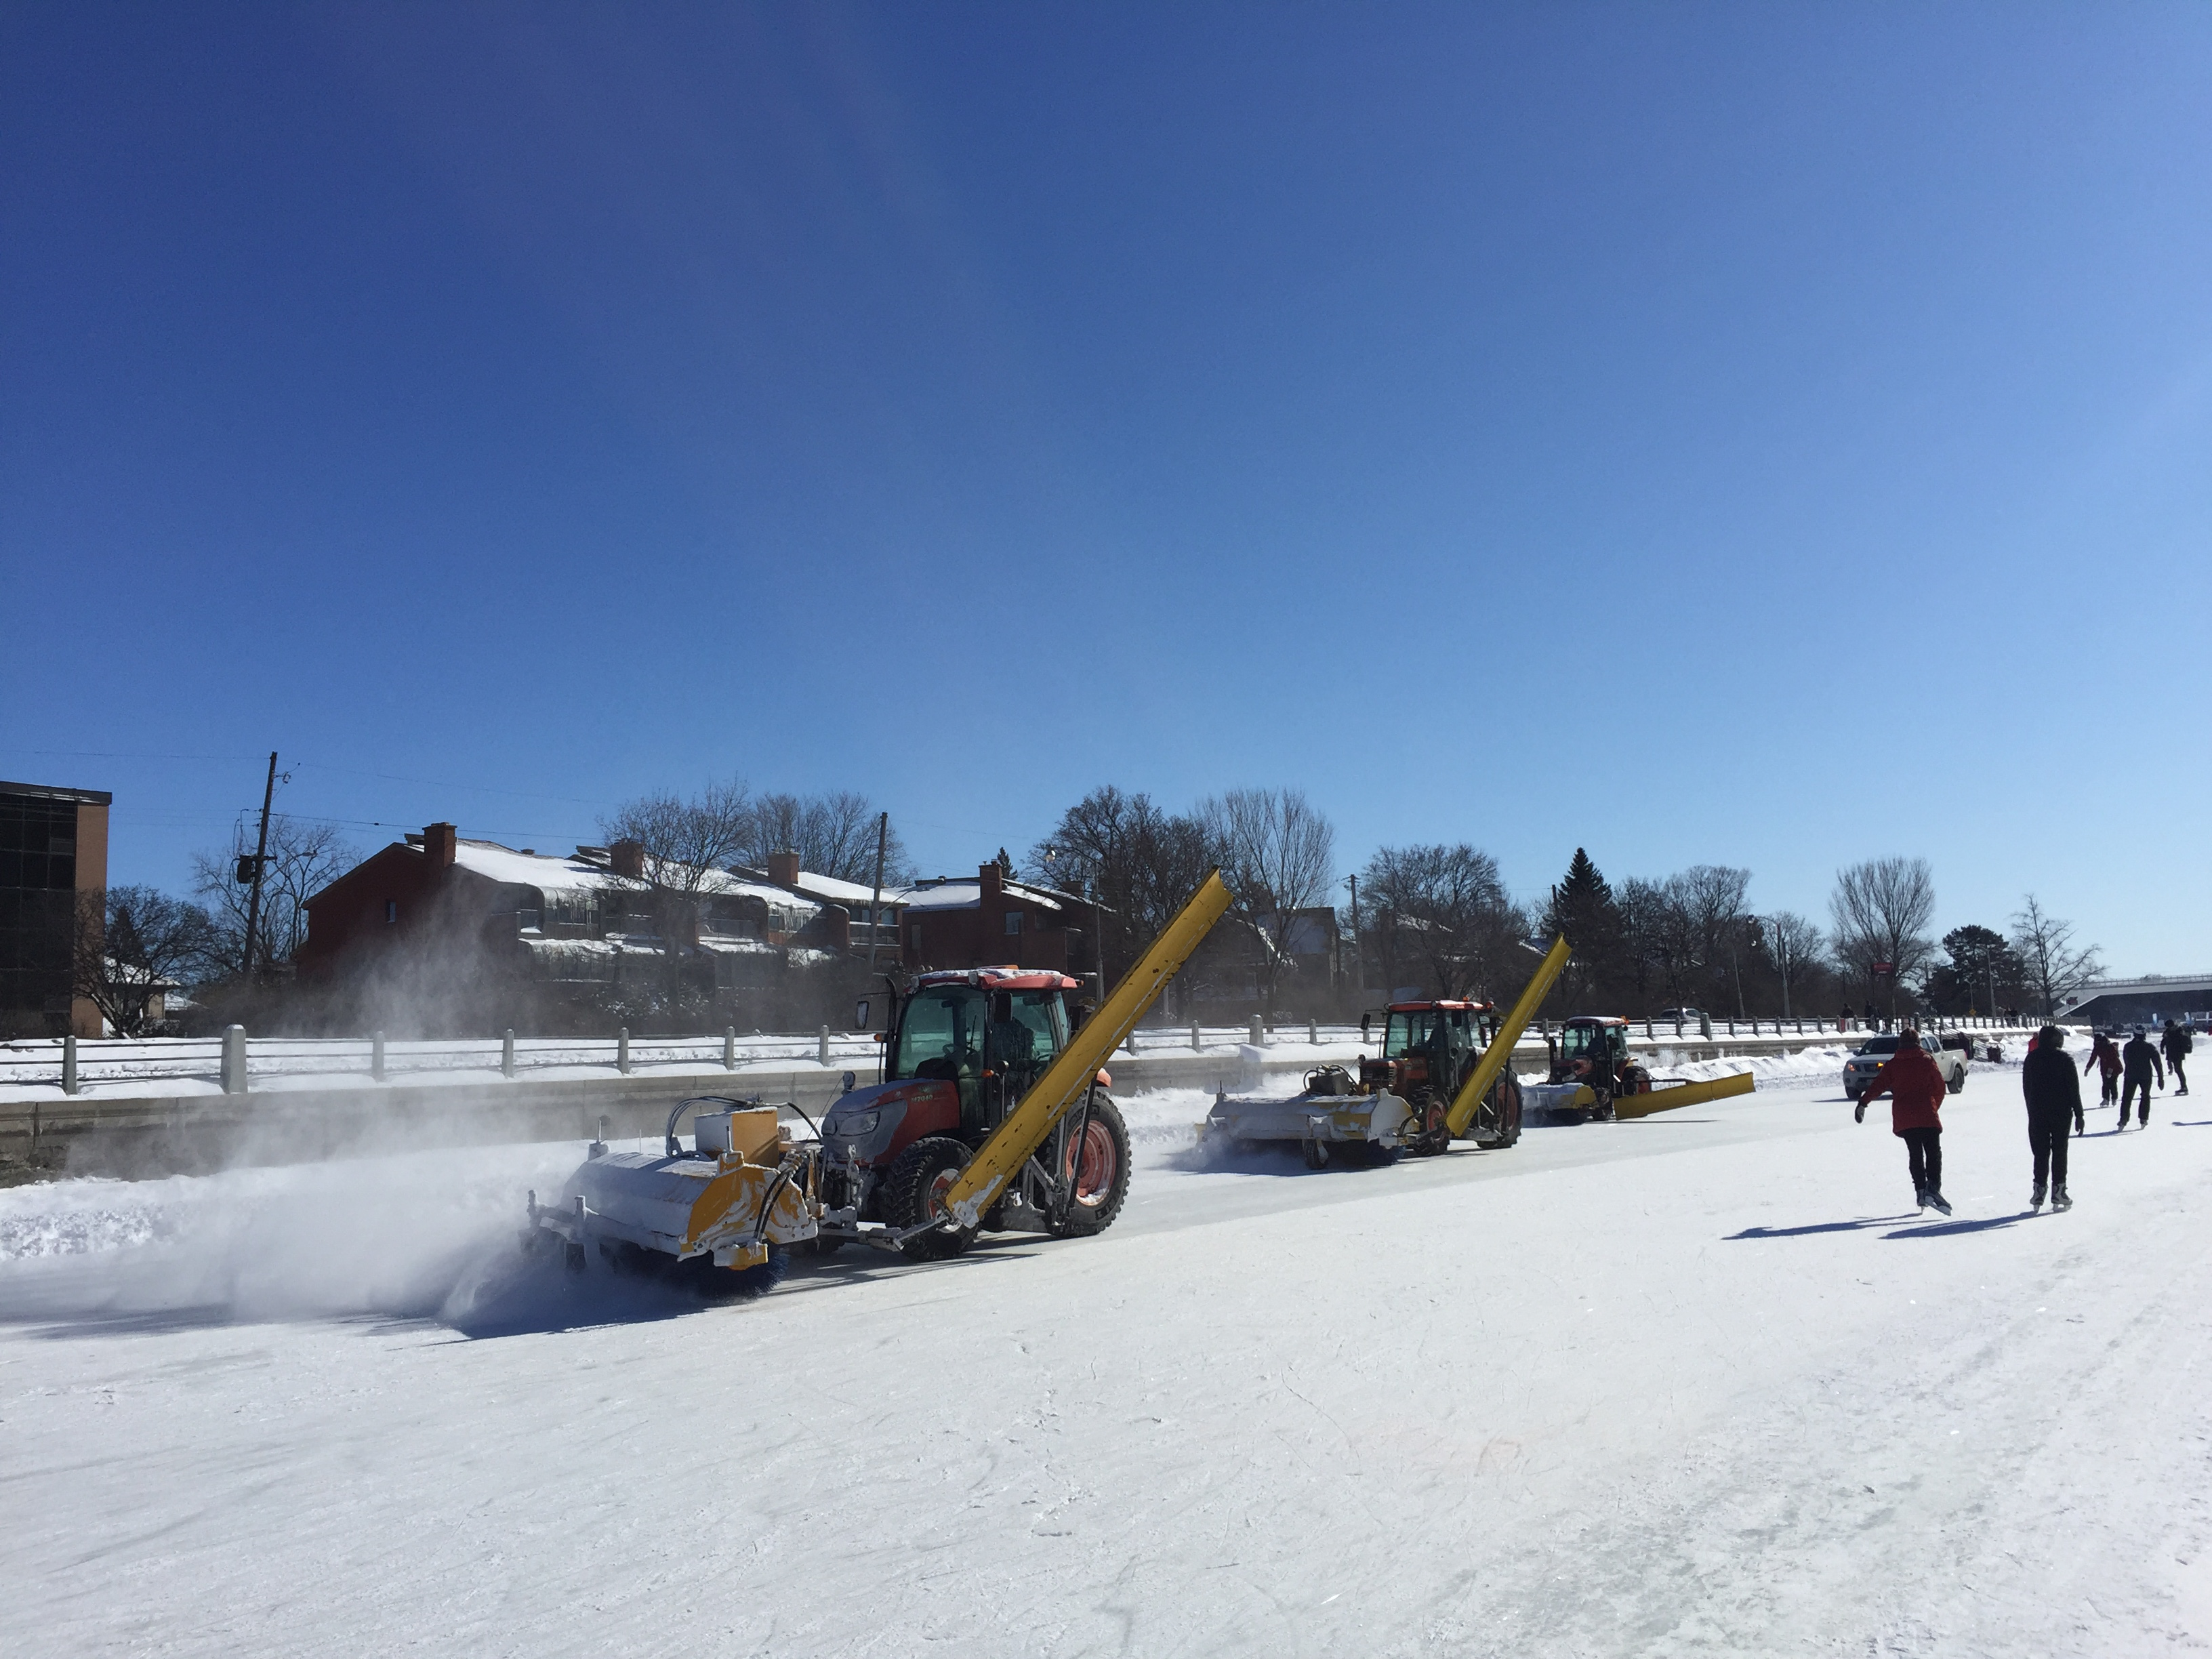 Snowplows on the ice